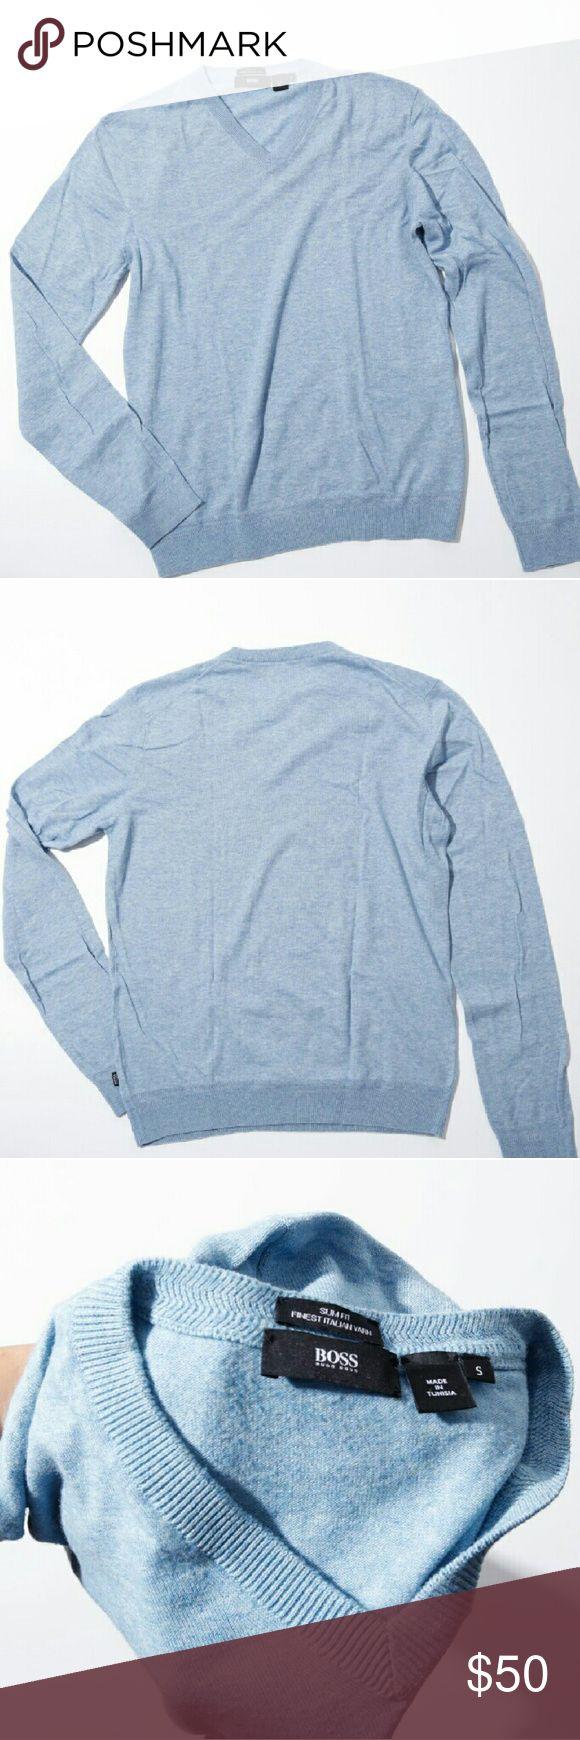 Boss by Hugo Boss men's cashmere sweater Men's Italian cashmere v neck, slim fit sweater. Light blue. No signs of wear. Size S. Hugo Boss Sweaters V-Neck